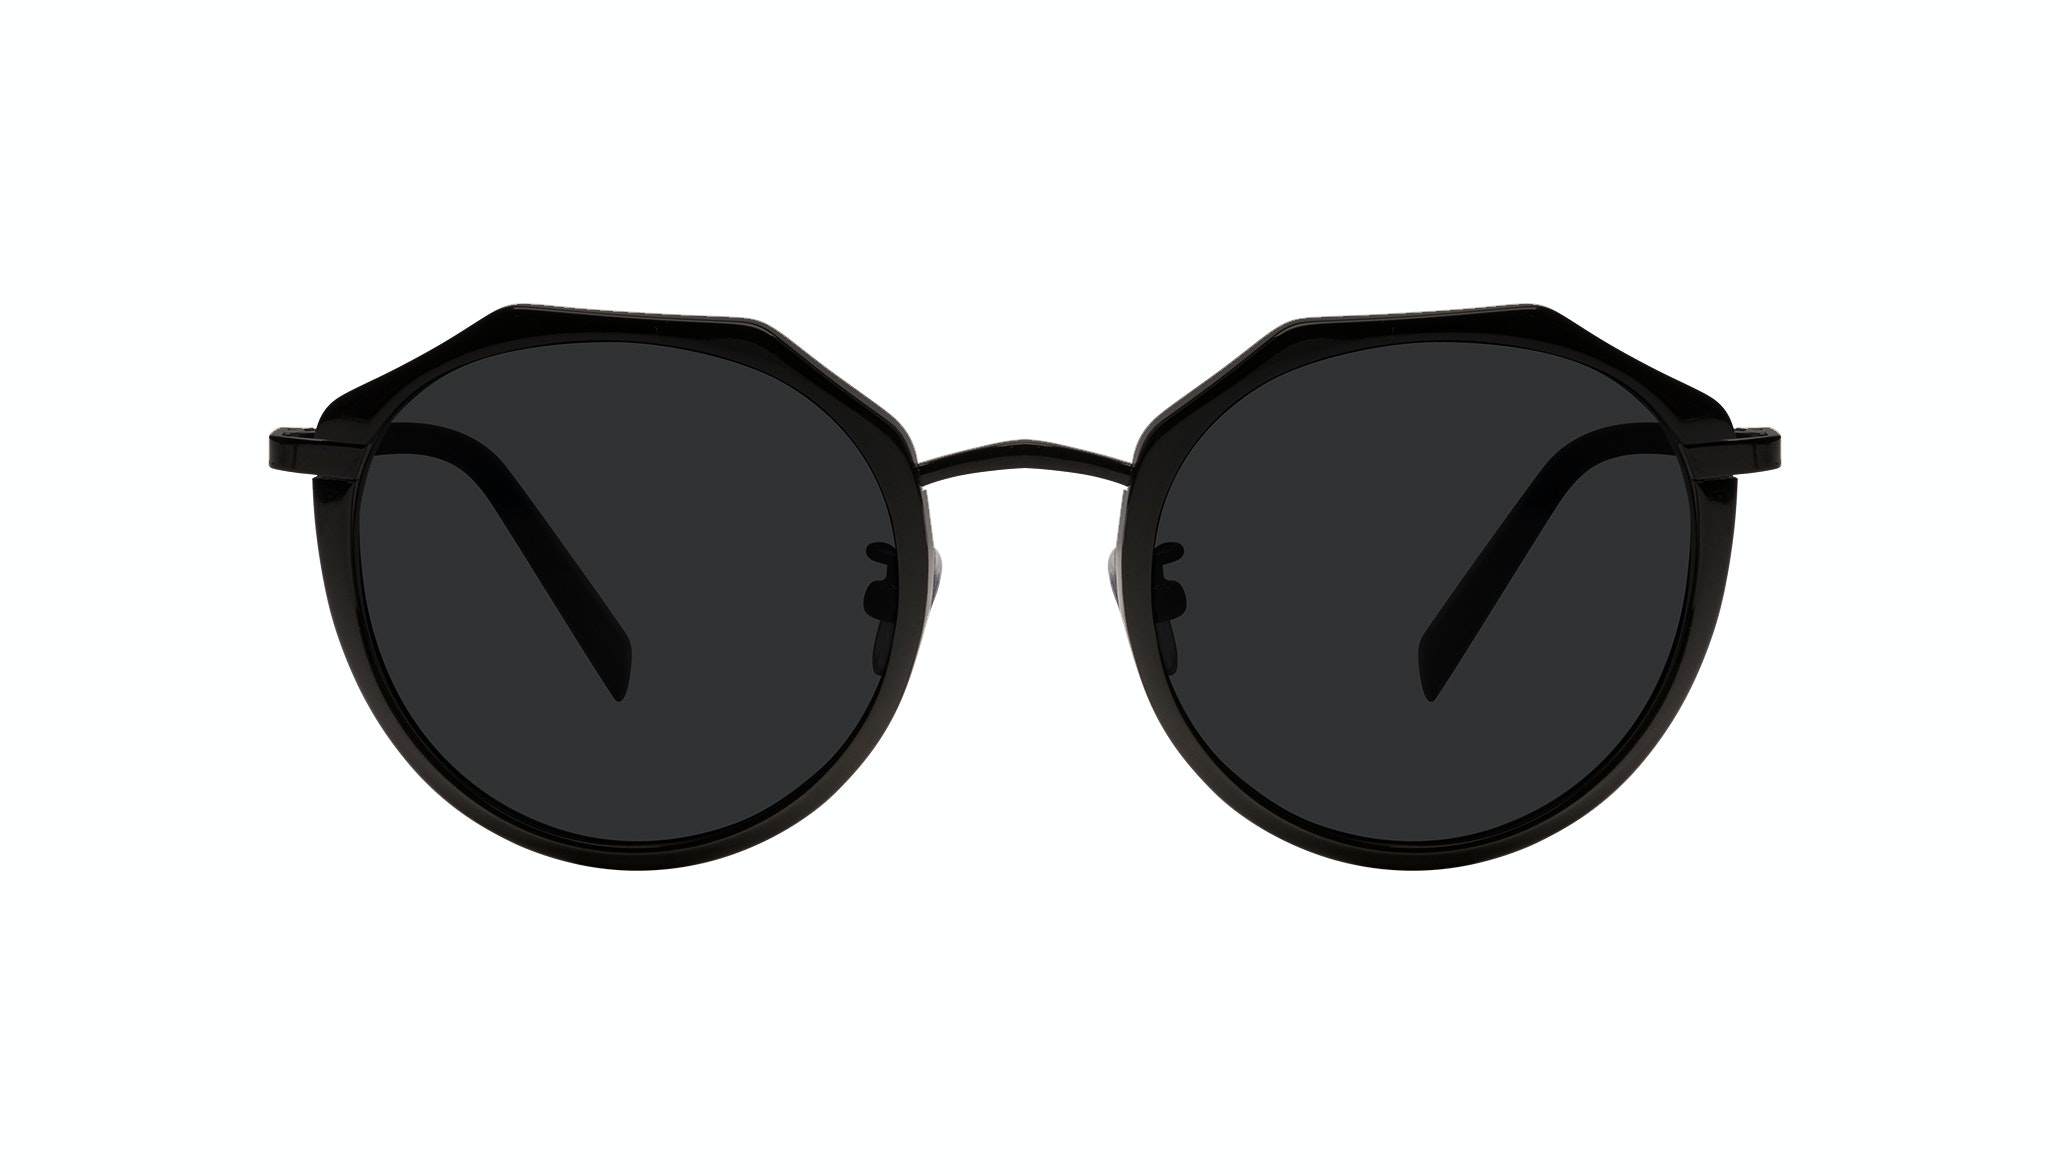 Affordable Fashion Glasses Round Sunglasses Women Womance Matte Front